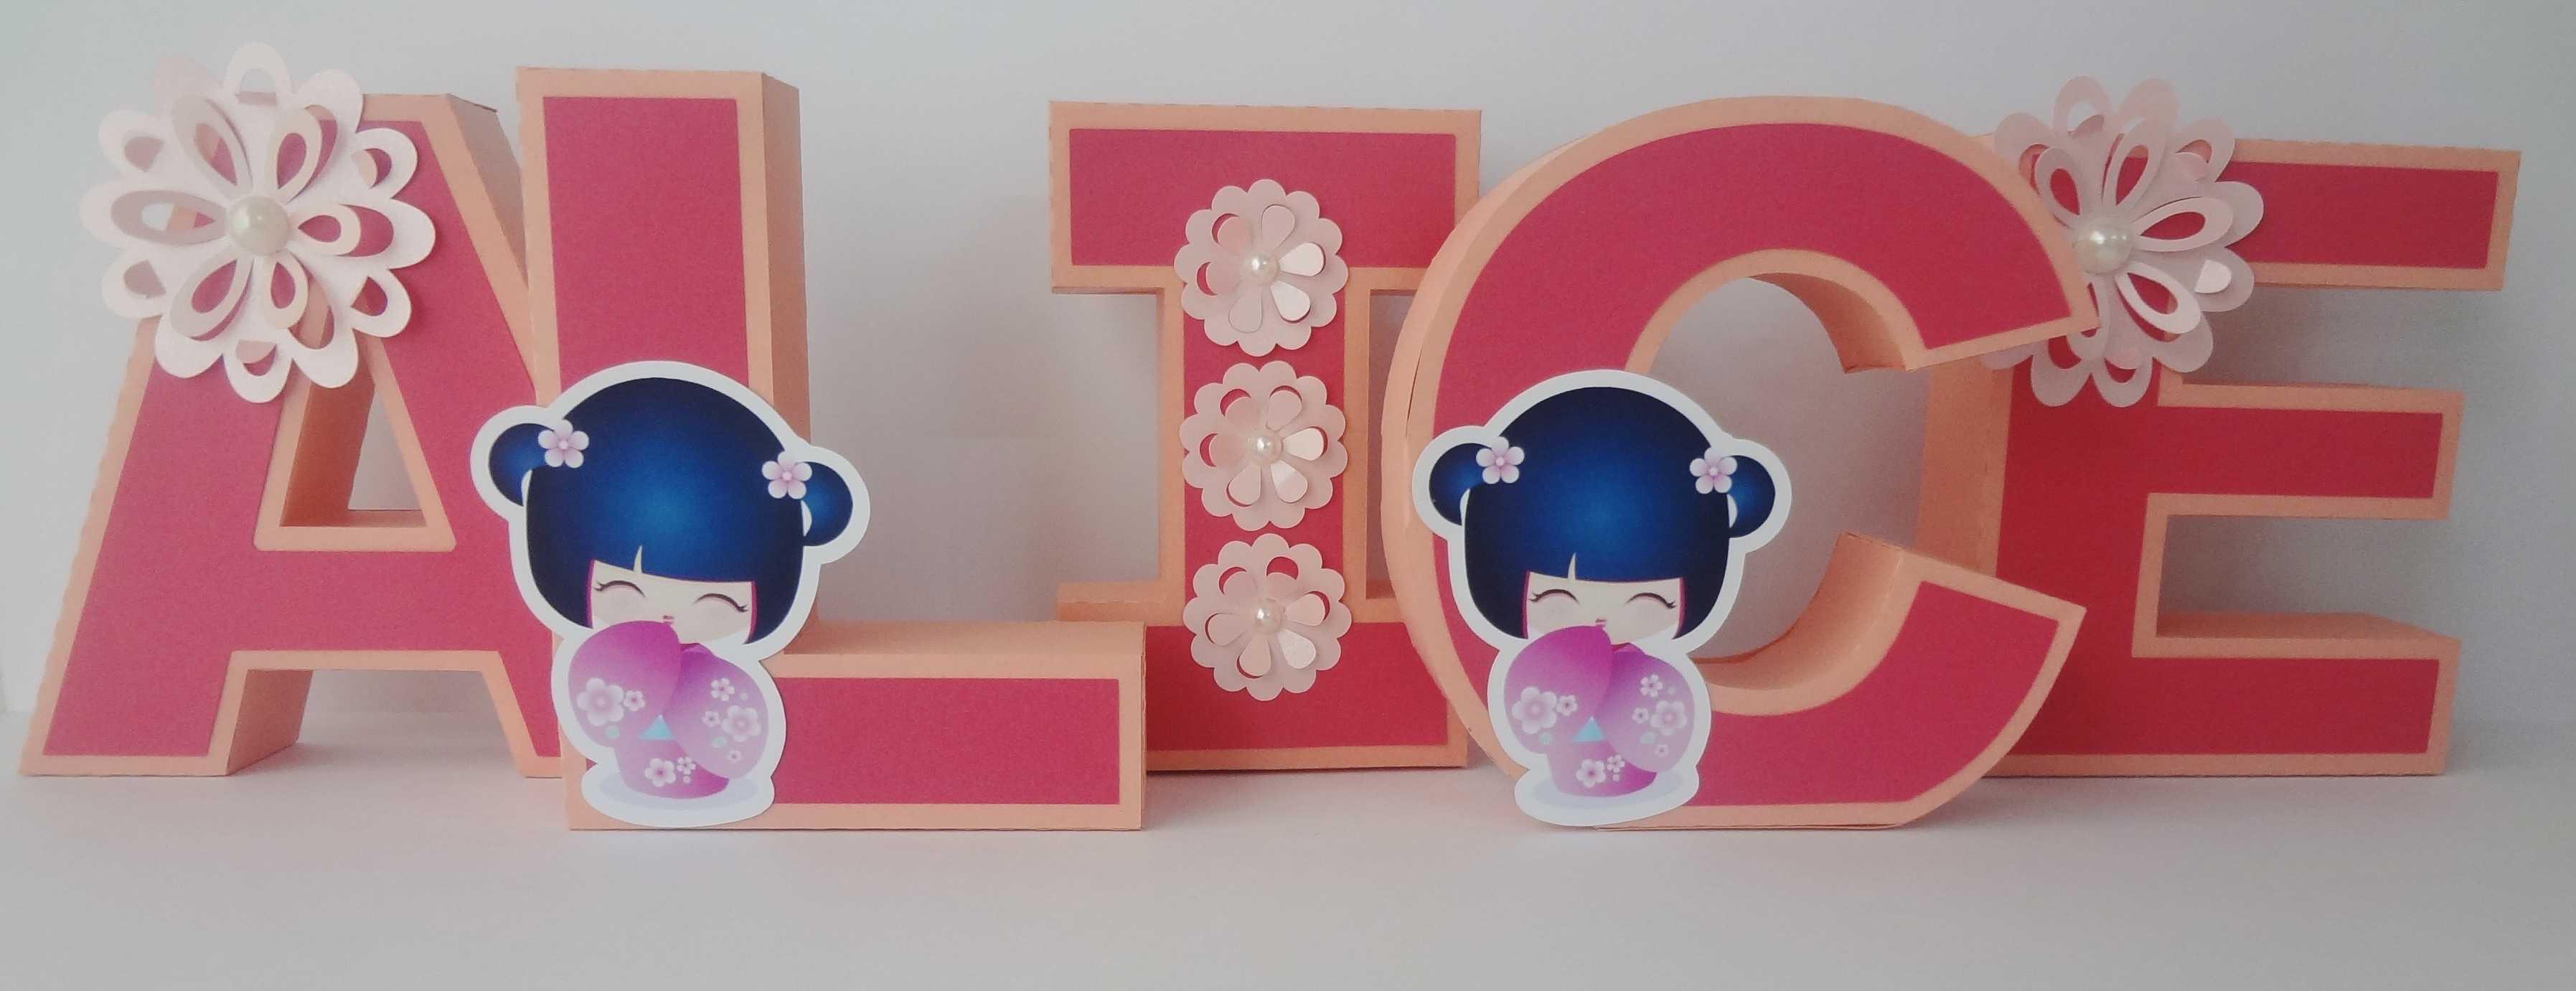 Letras 3d para decorar encantar e brilhar papel e - Letras para decorar habitacion infantil ...